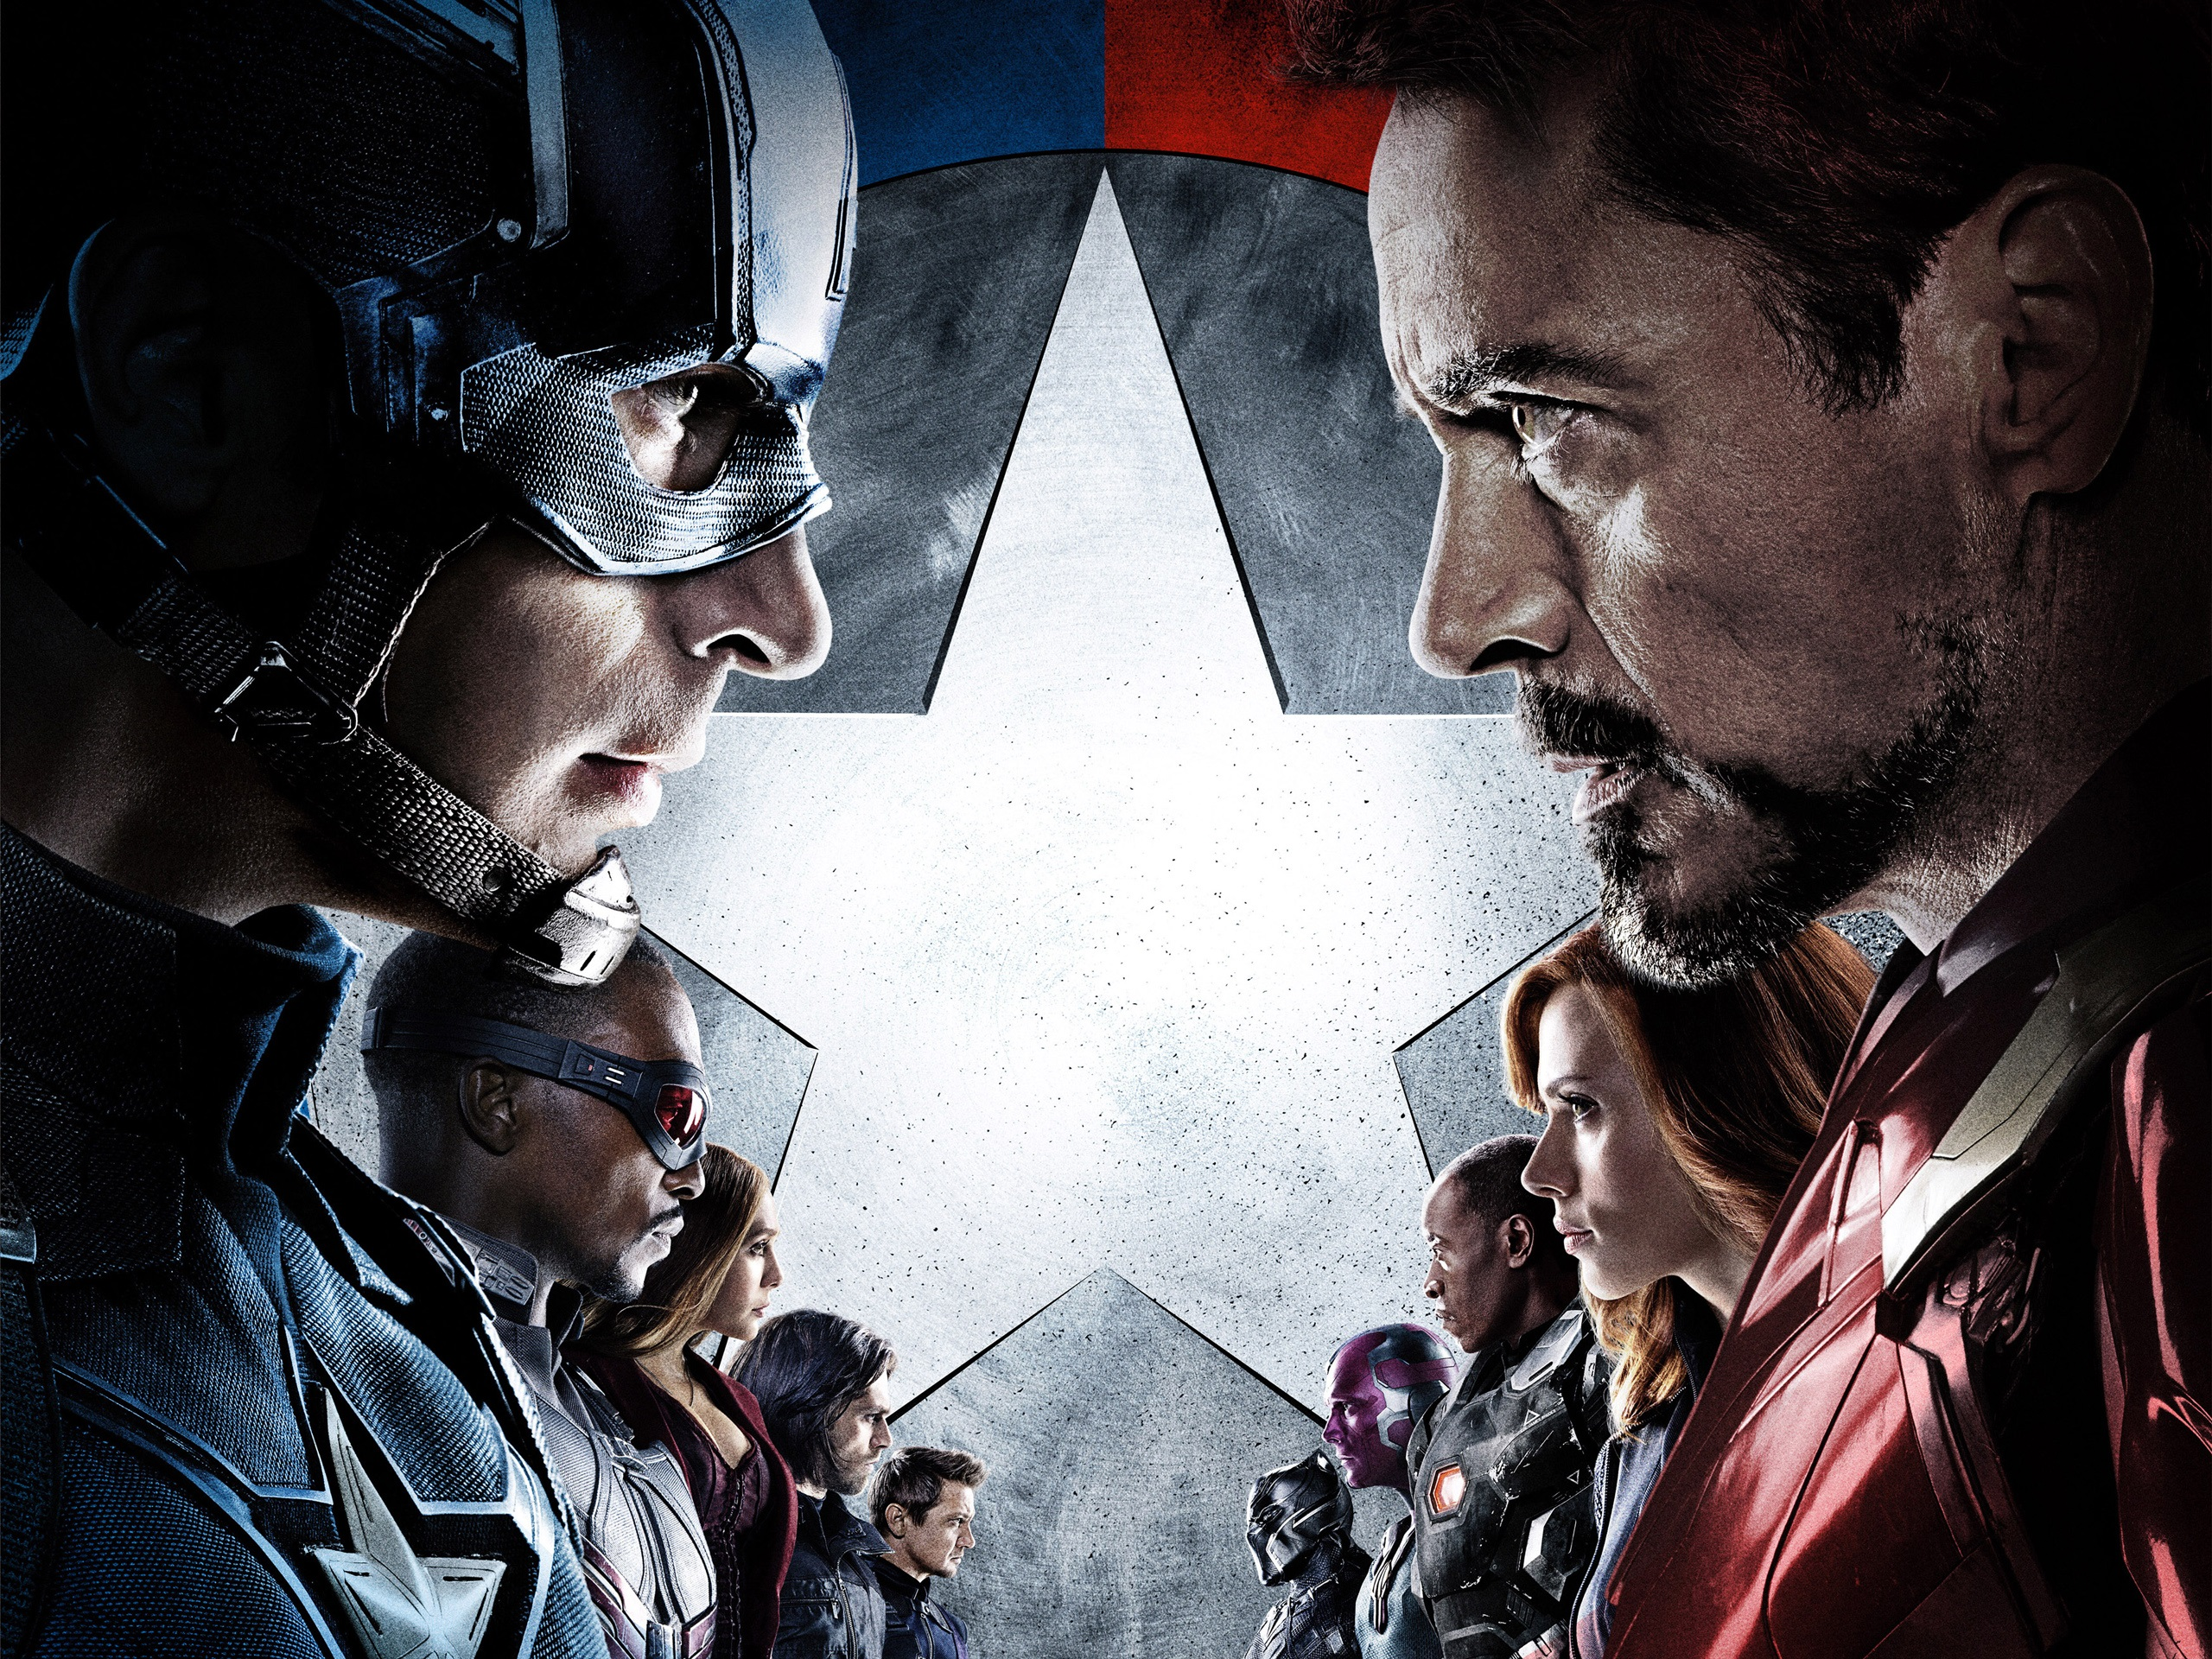 Wallpaper Captain America Civil War 2016 2560x1920 Hd Picture Image